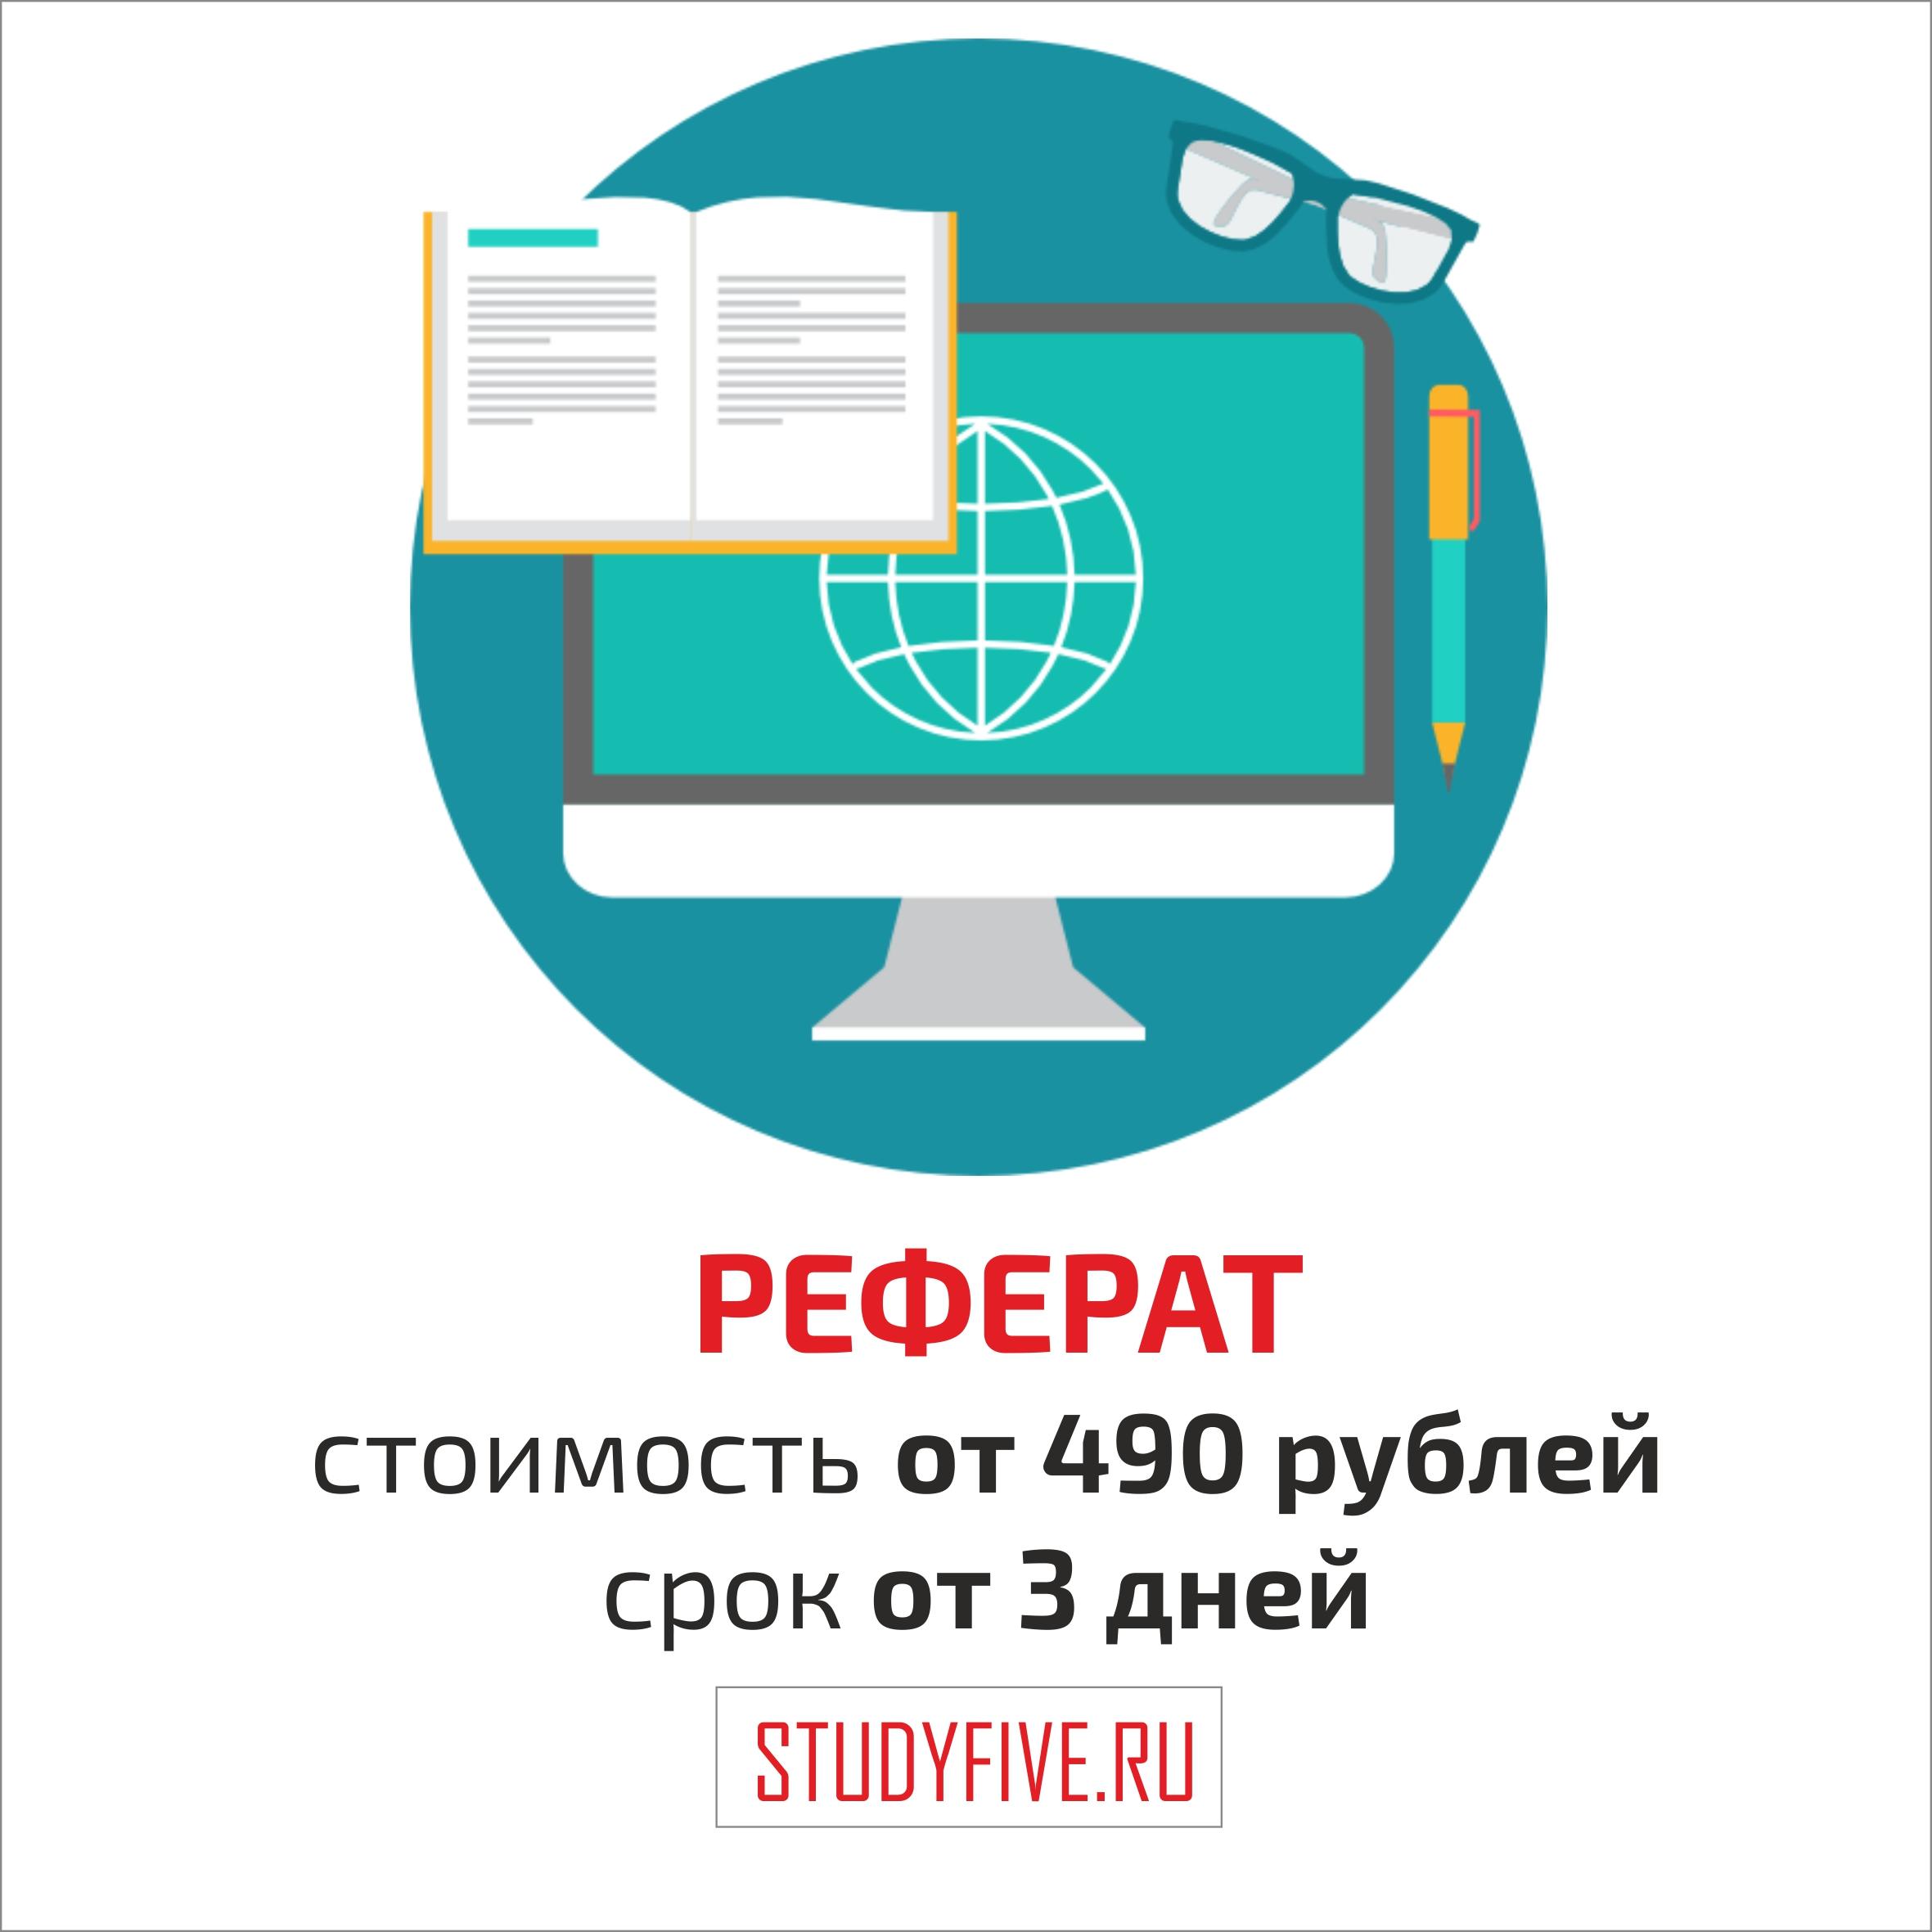 Заказ реферата недорого 300 рублей 5786